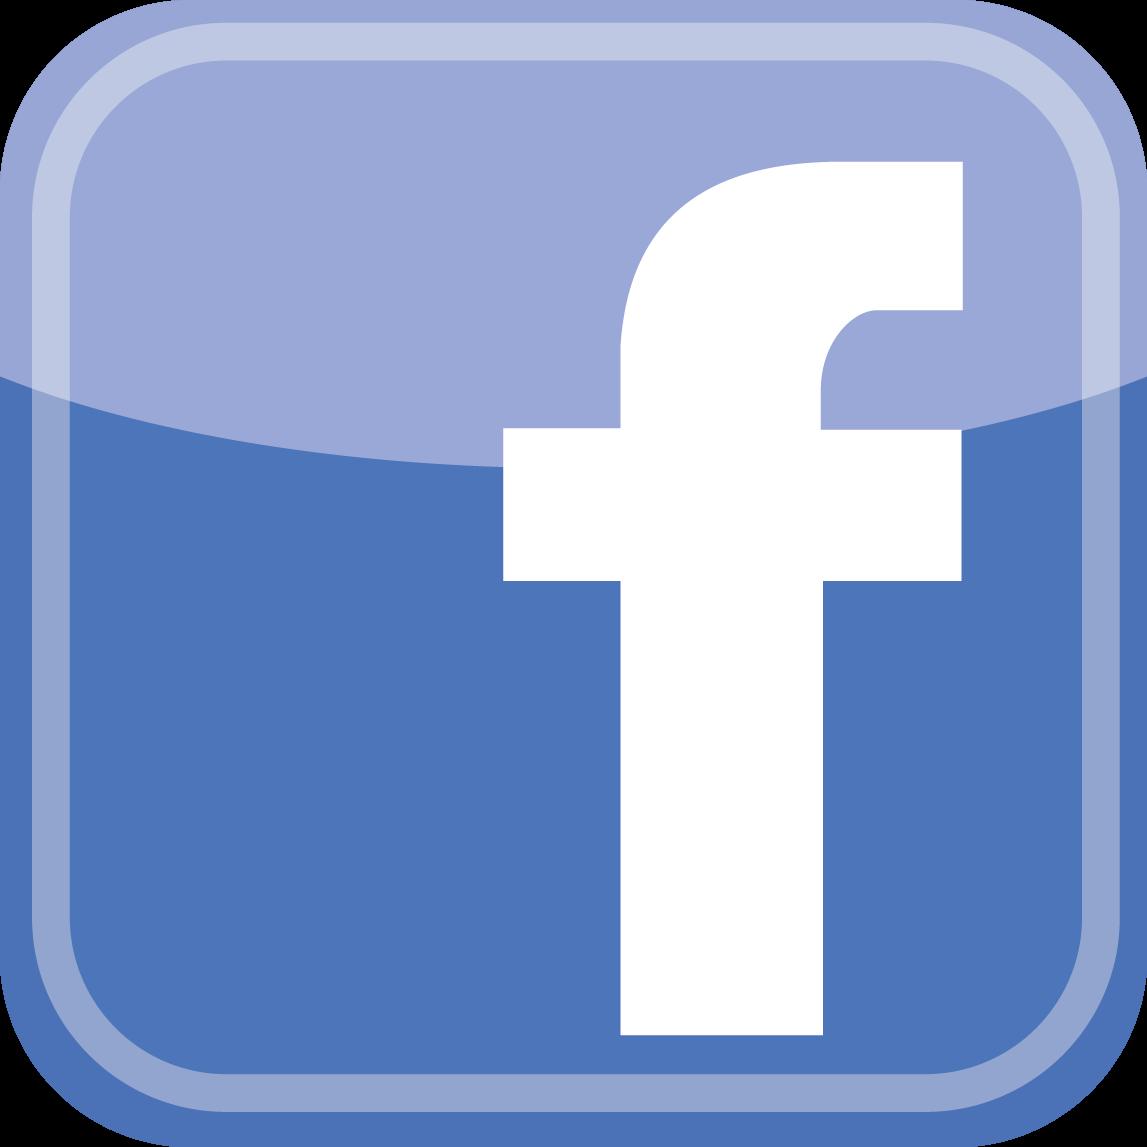 prinzessin estelle facebook